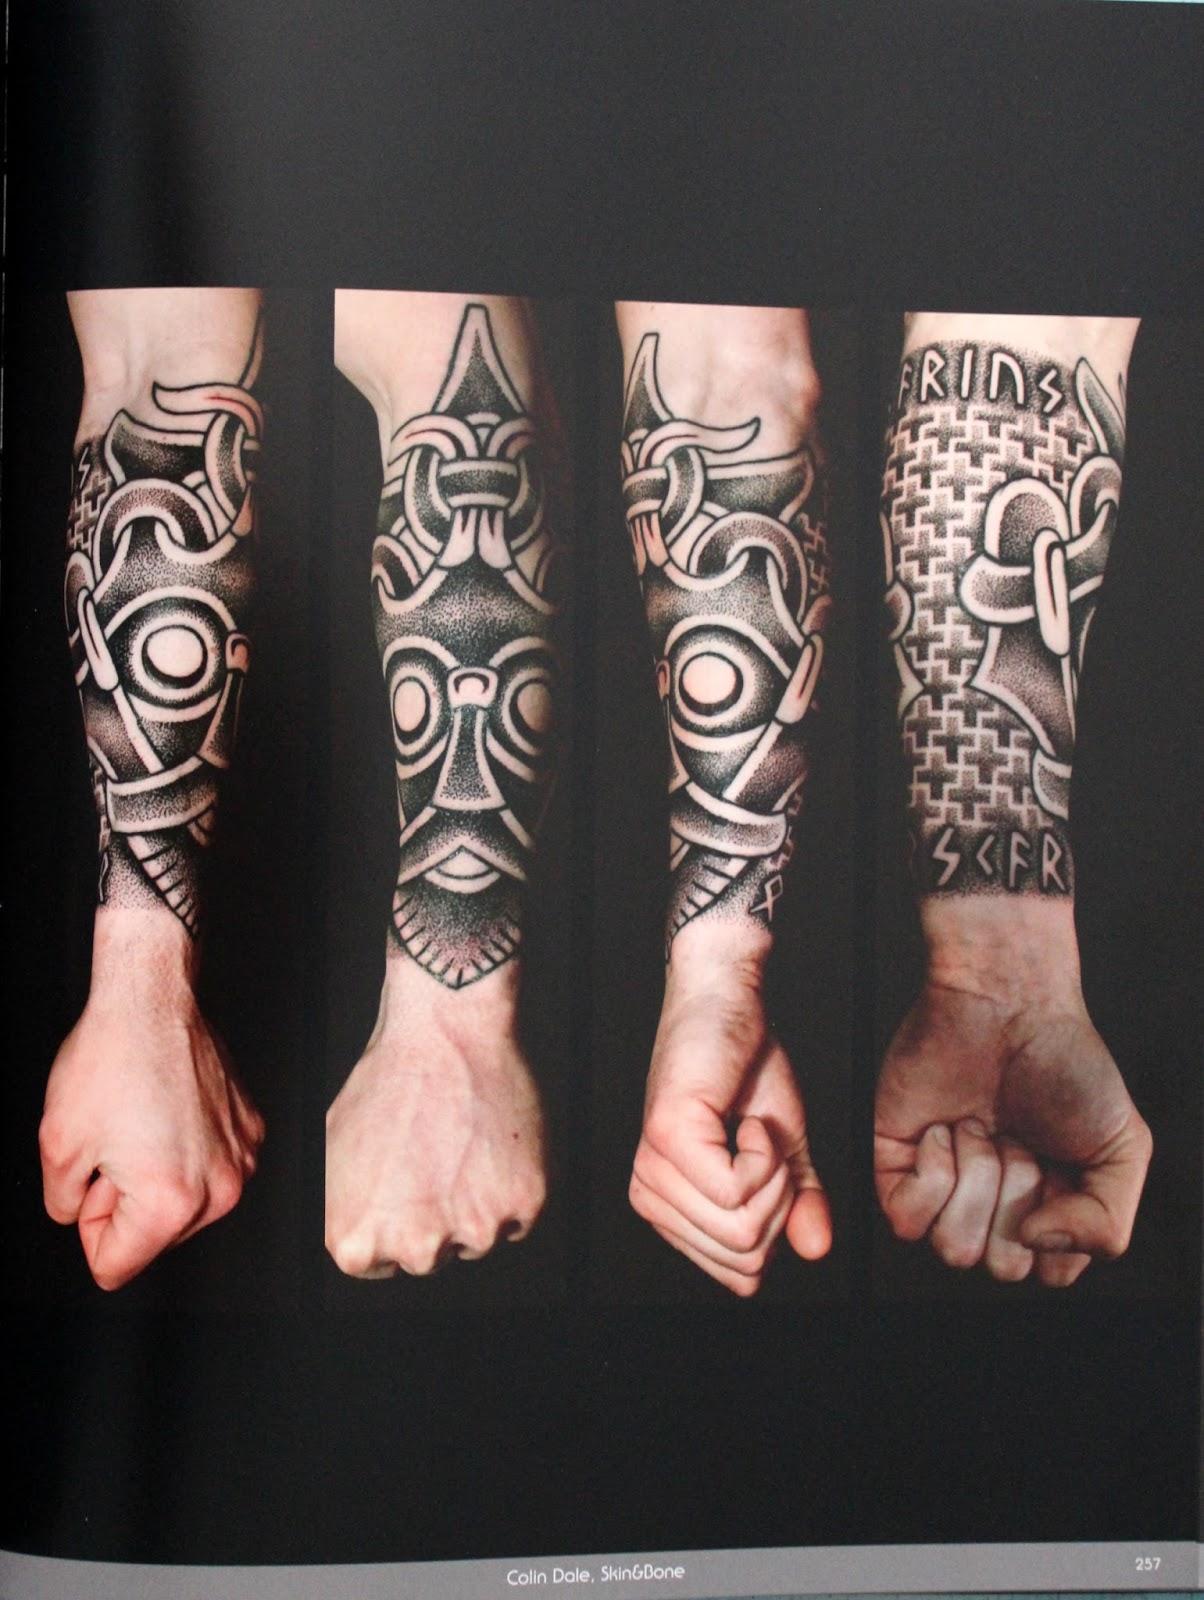 nordic rune tattoo designs 80 rune tattoos for men. Black Bedroom Furniture Sets. Home Design Ideas